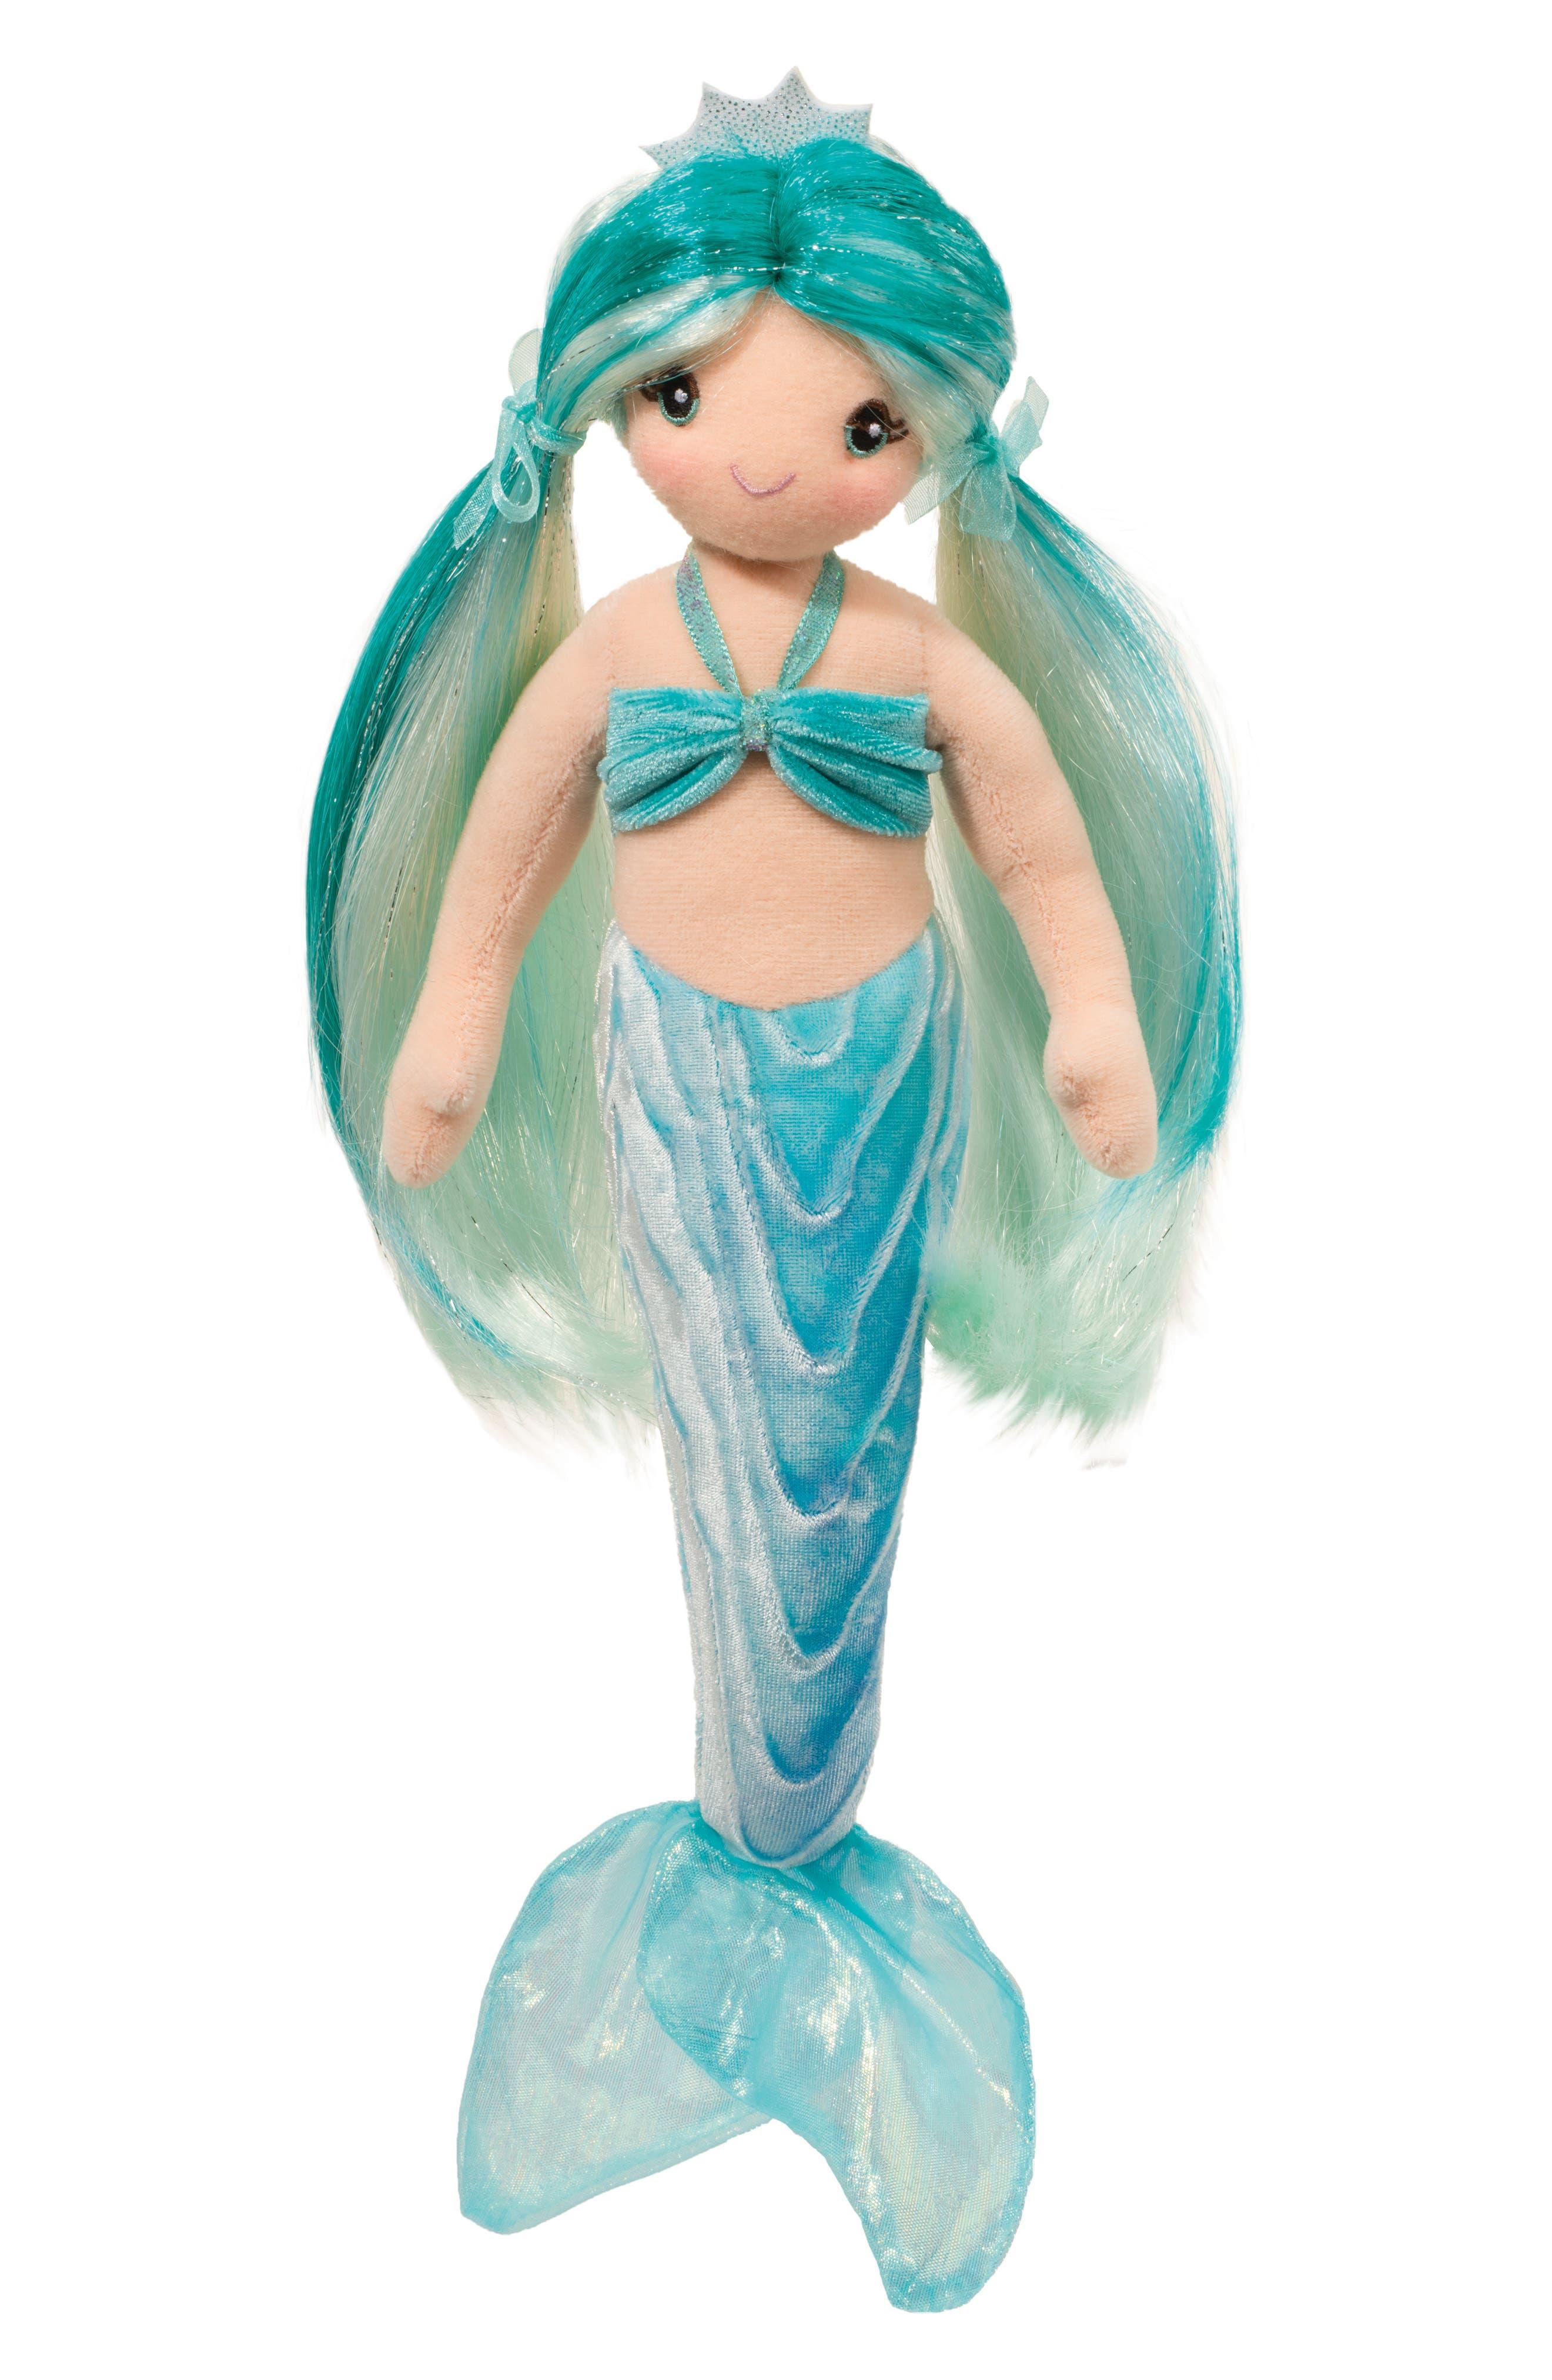 Douglas Ciara Aqua Mermaid Stuffed Toy